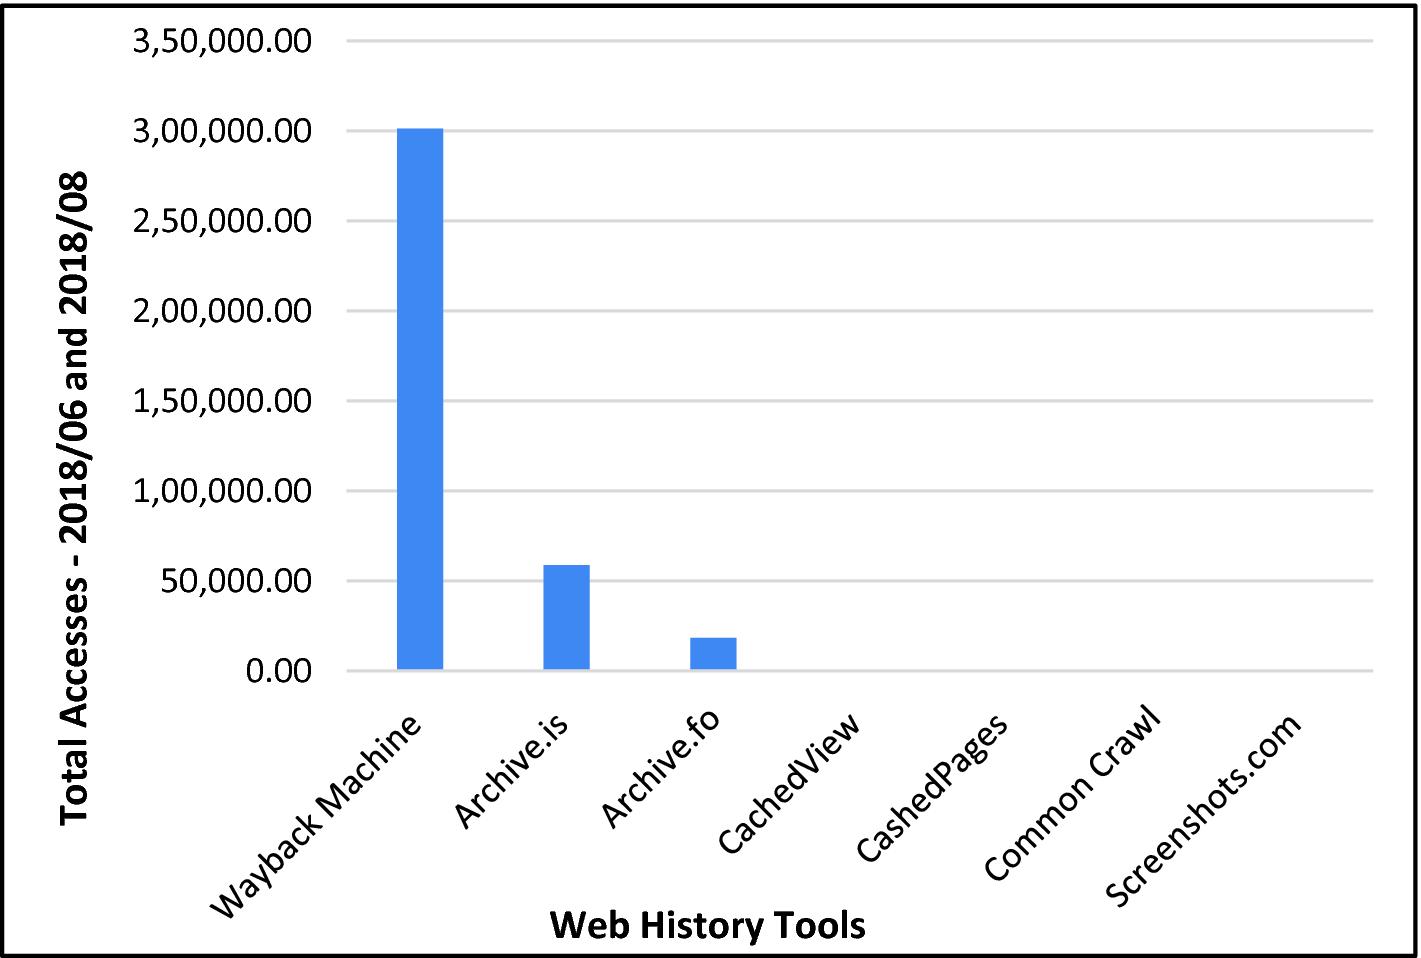 Classification of Web History Tools Through Web Analysis